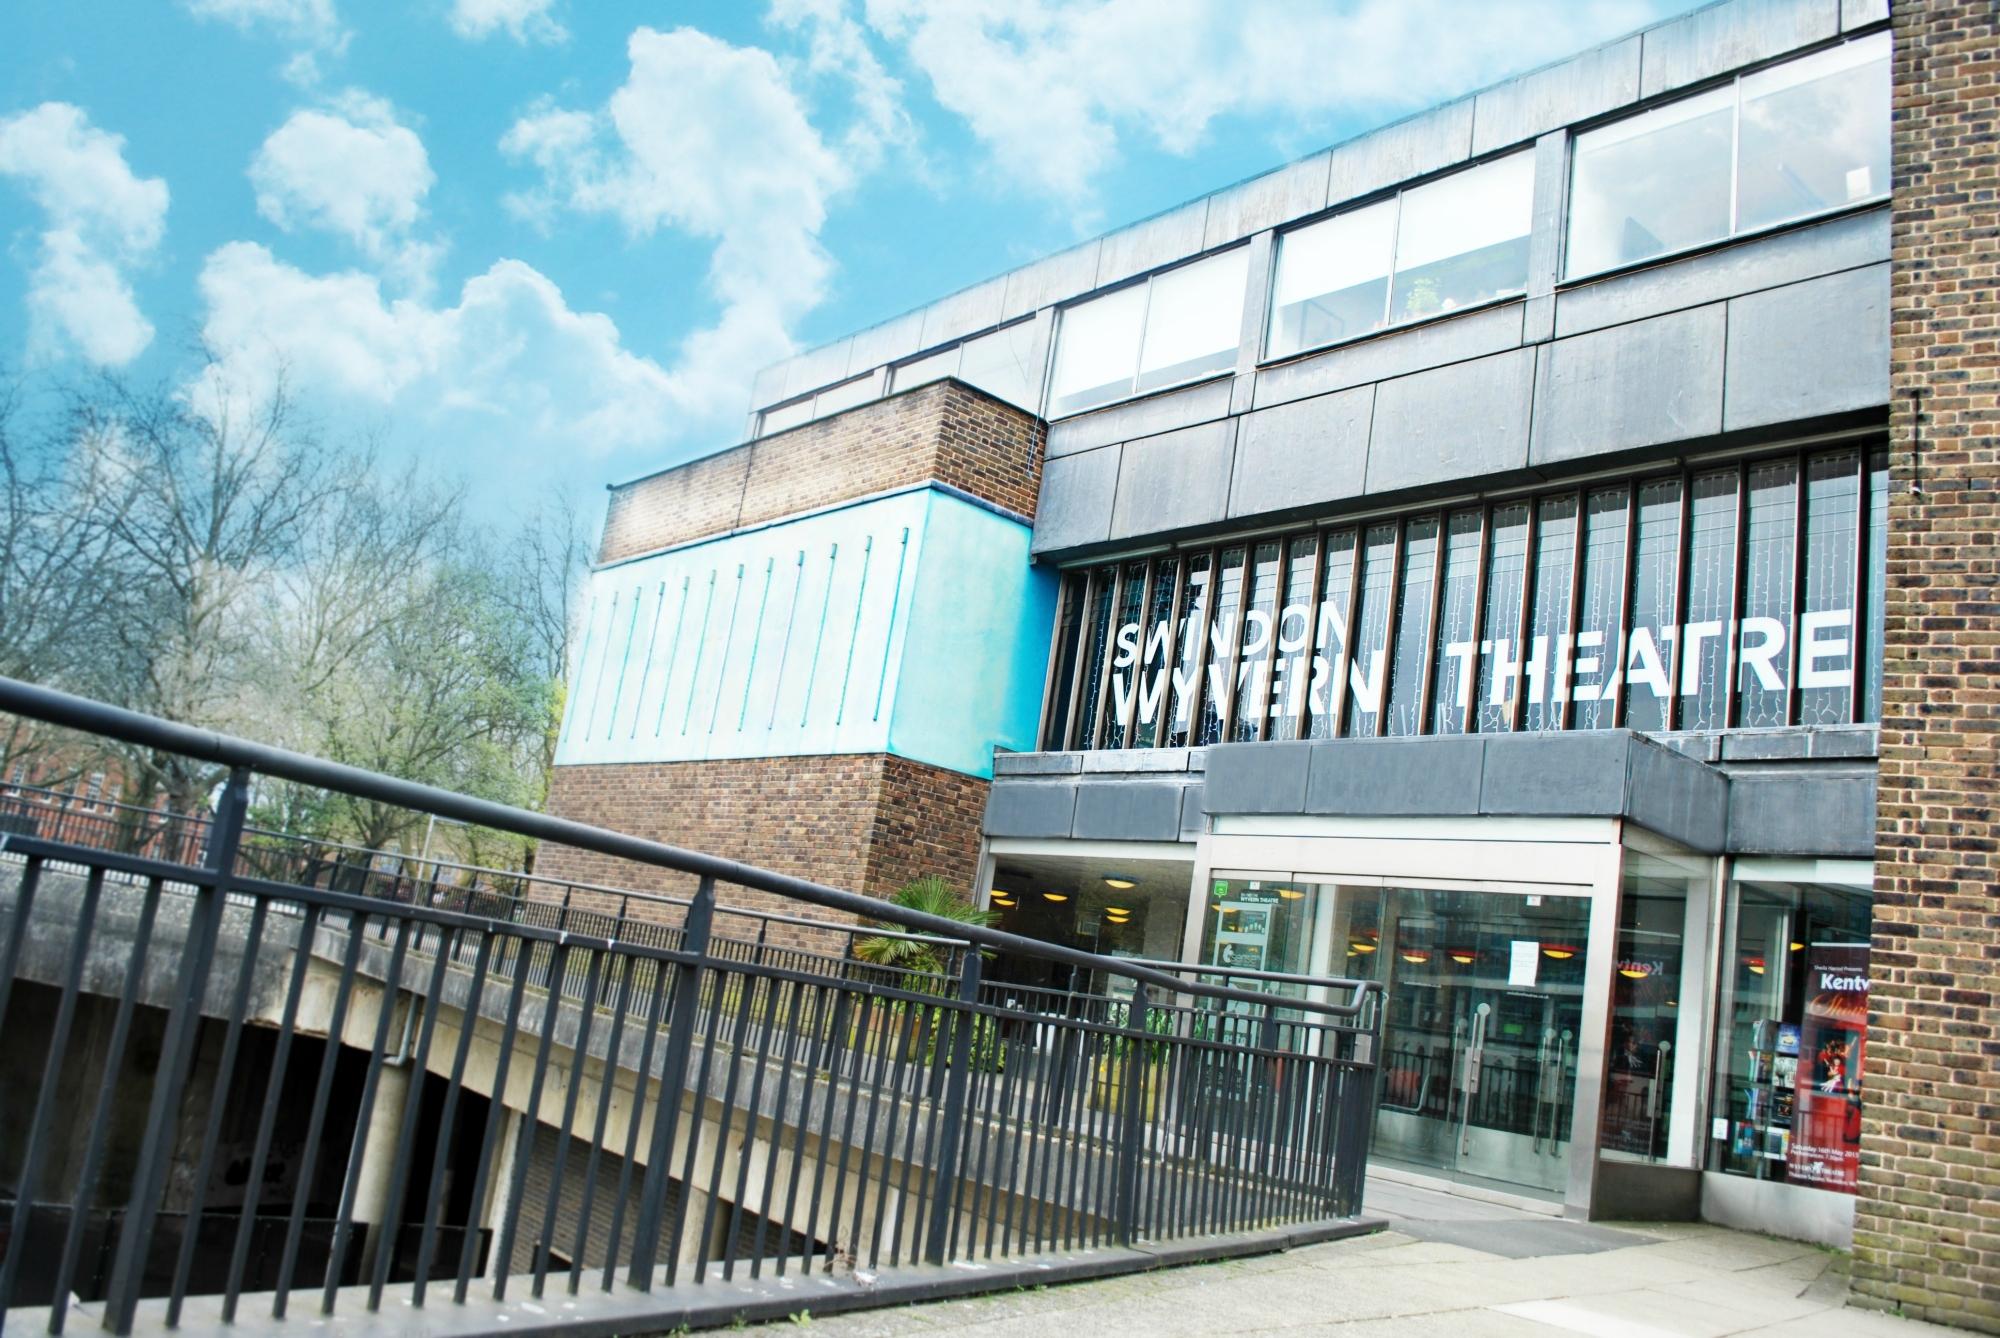 Swindon Wyvern Theatre